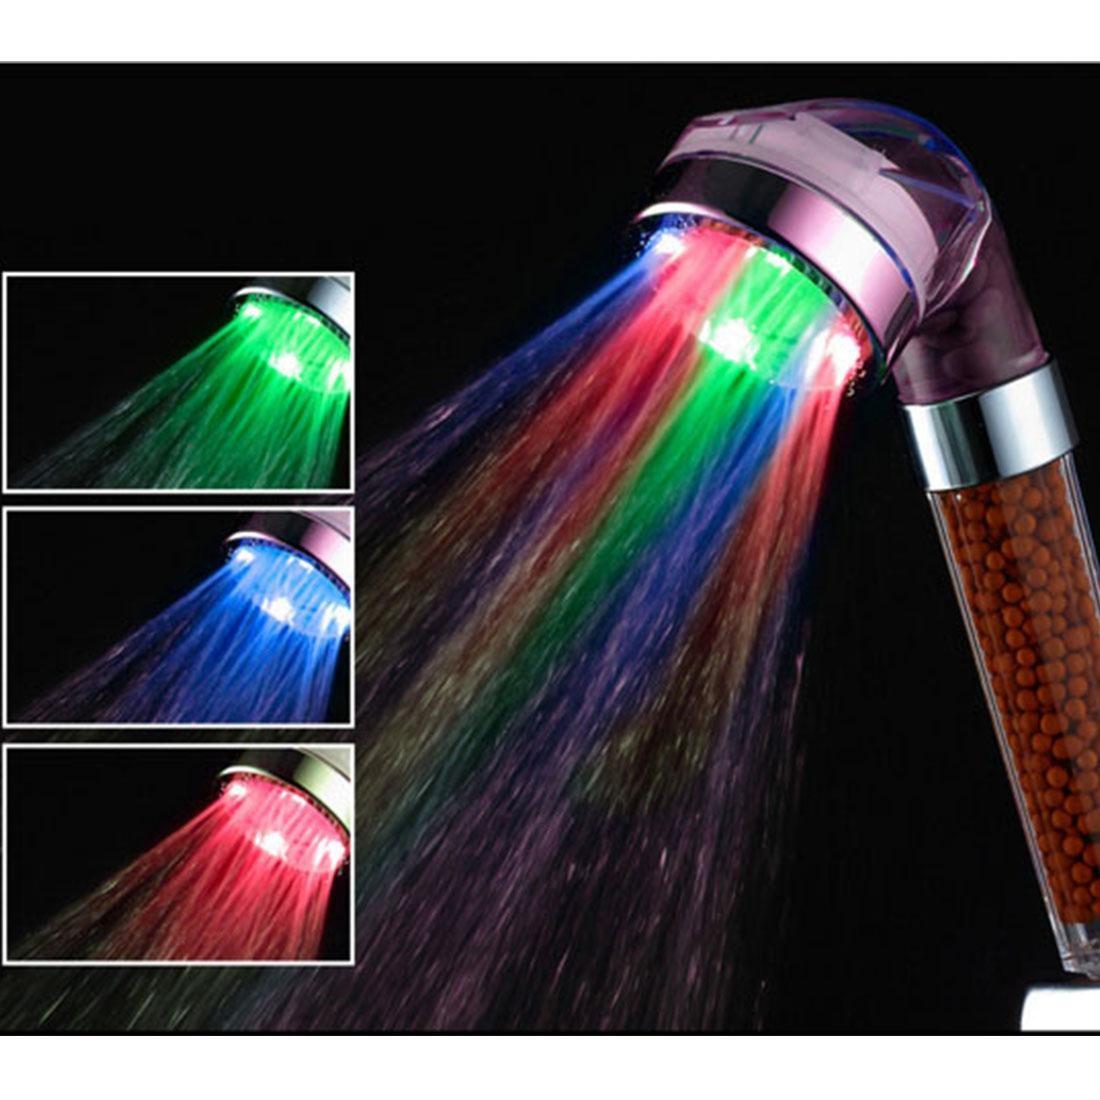 7 colors change led shower tourmaline spa anion hand held b